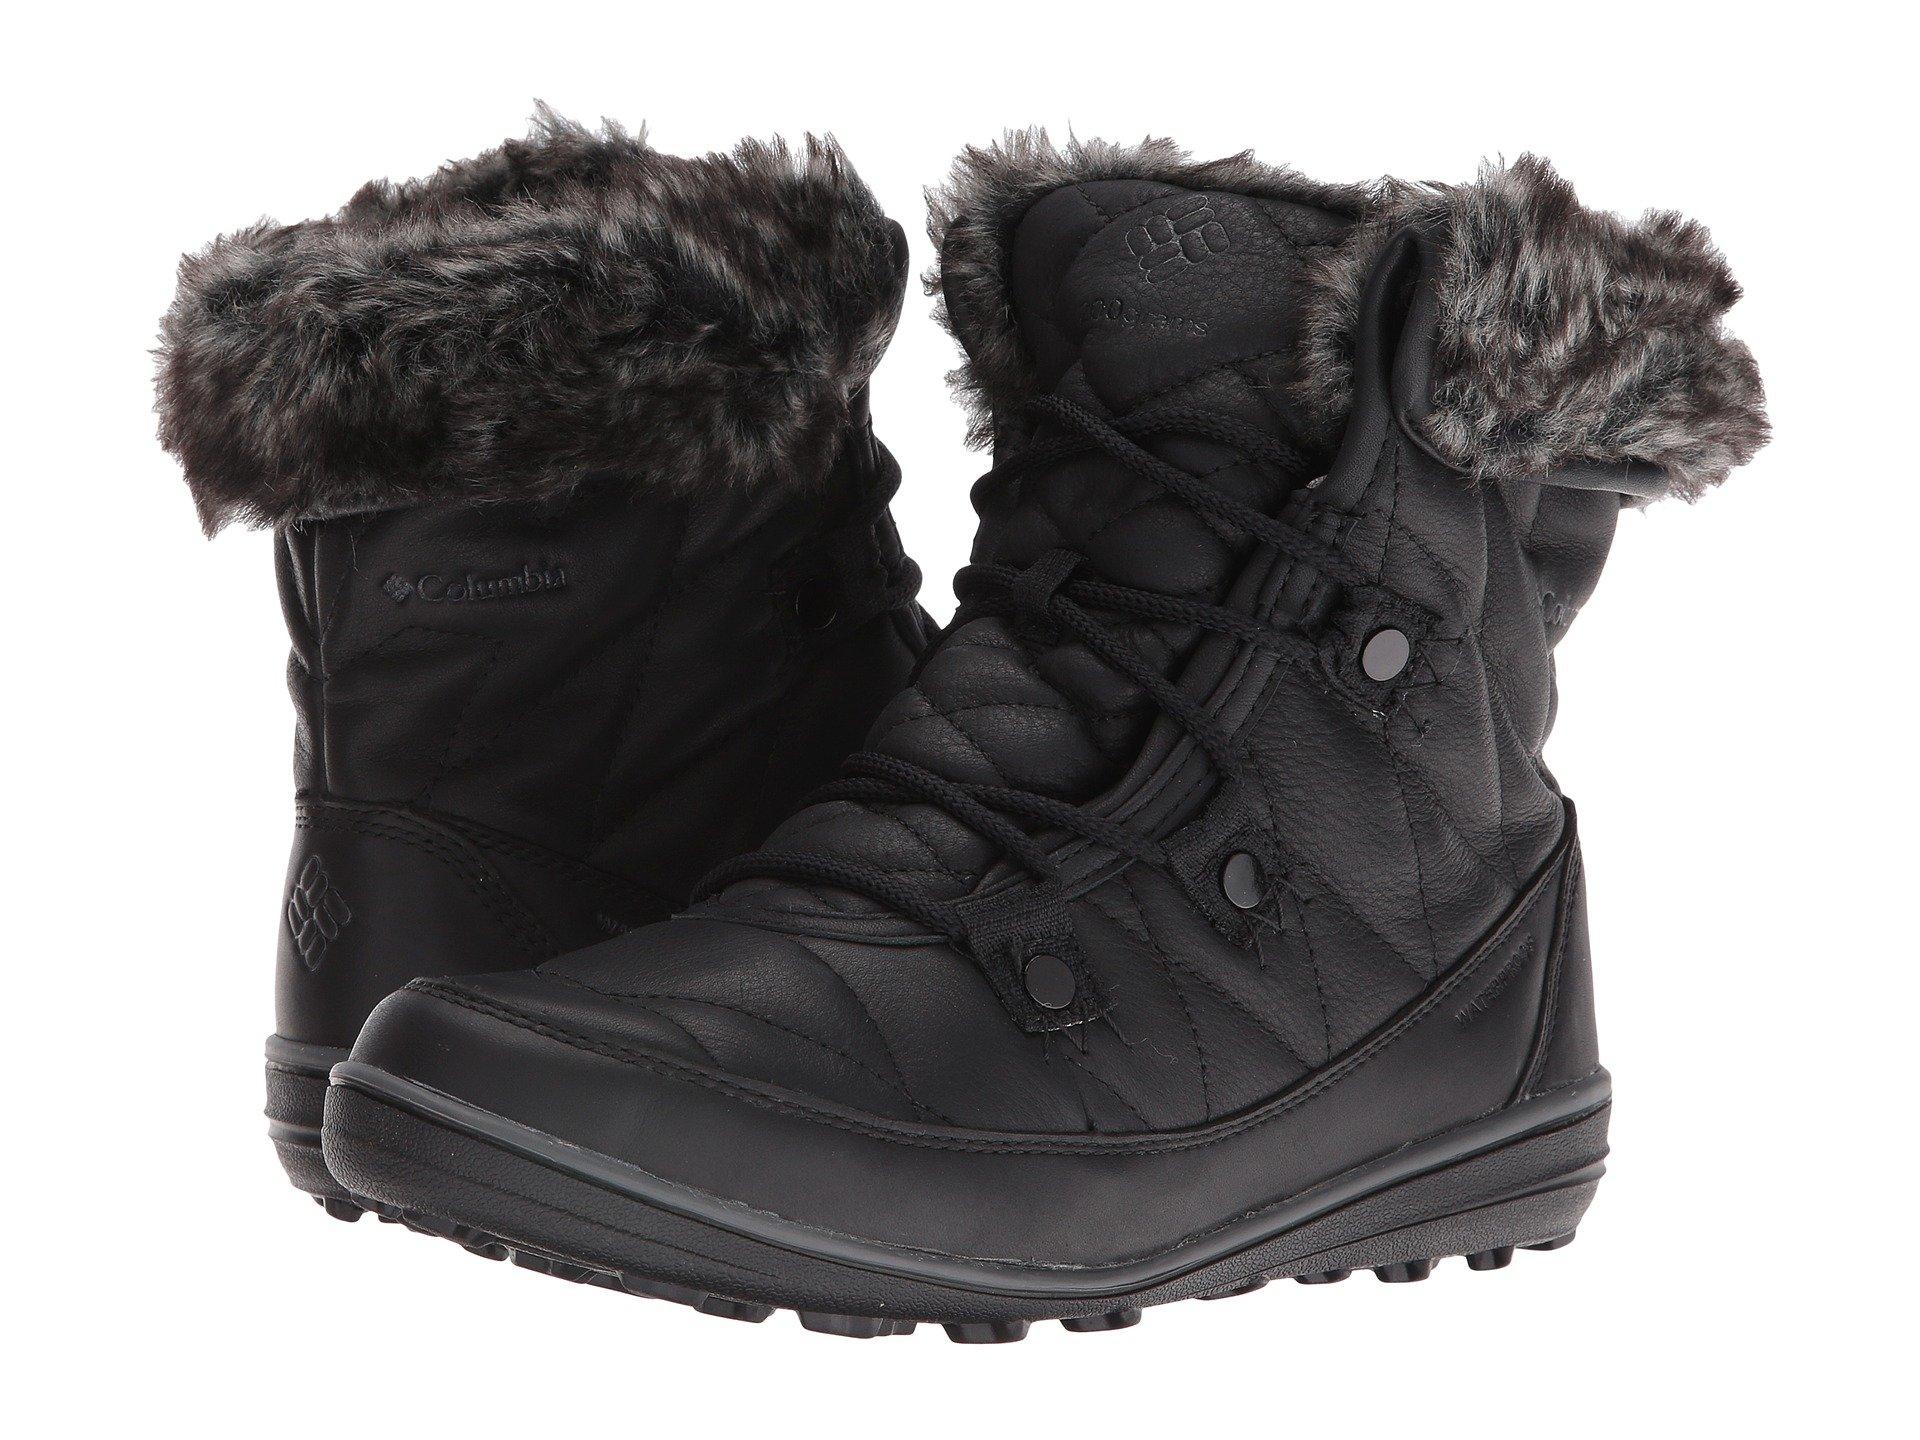 0f72753e17b Columbia Heavenly Shorty Omni-Heat Leather After Dark In Black Dark Fog